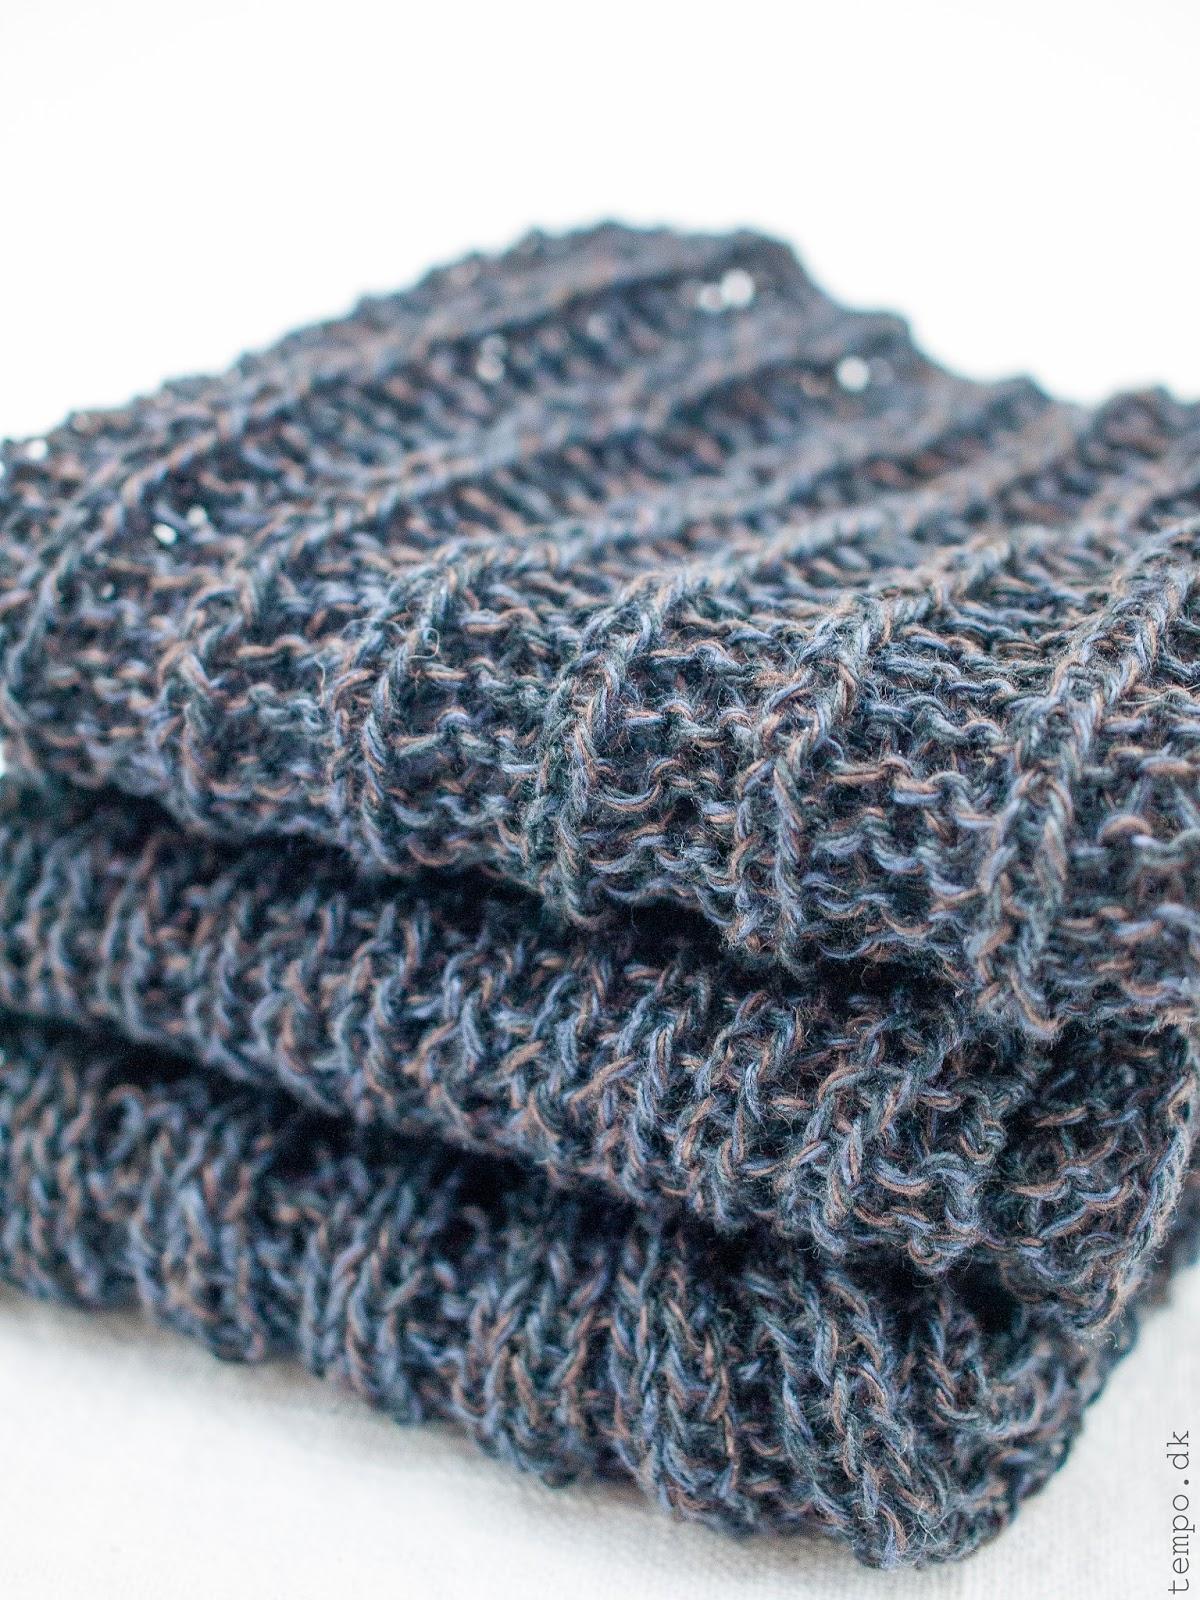 Oppskrifter på 3 strikkede karklude i hør